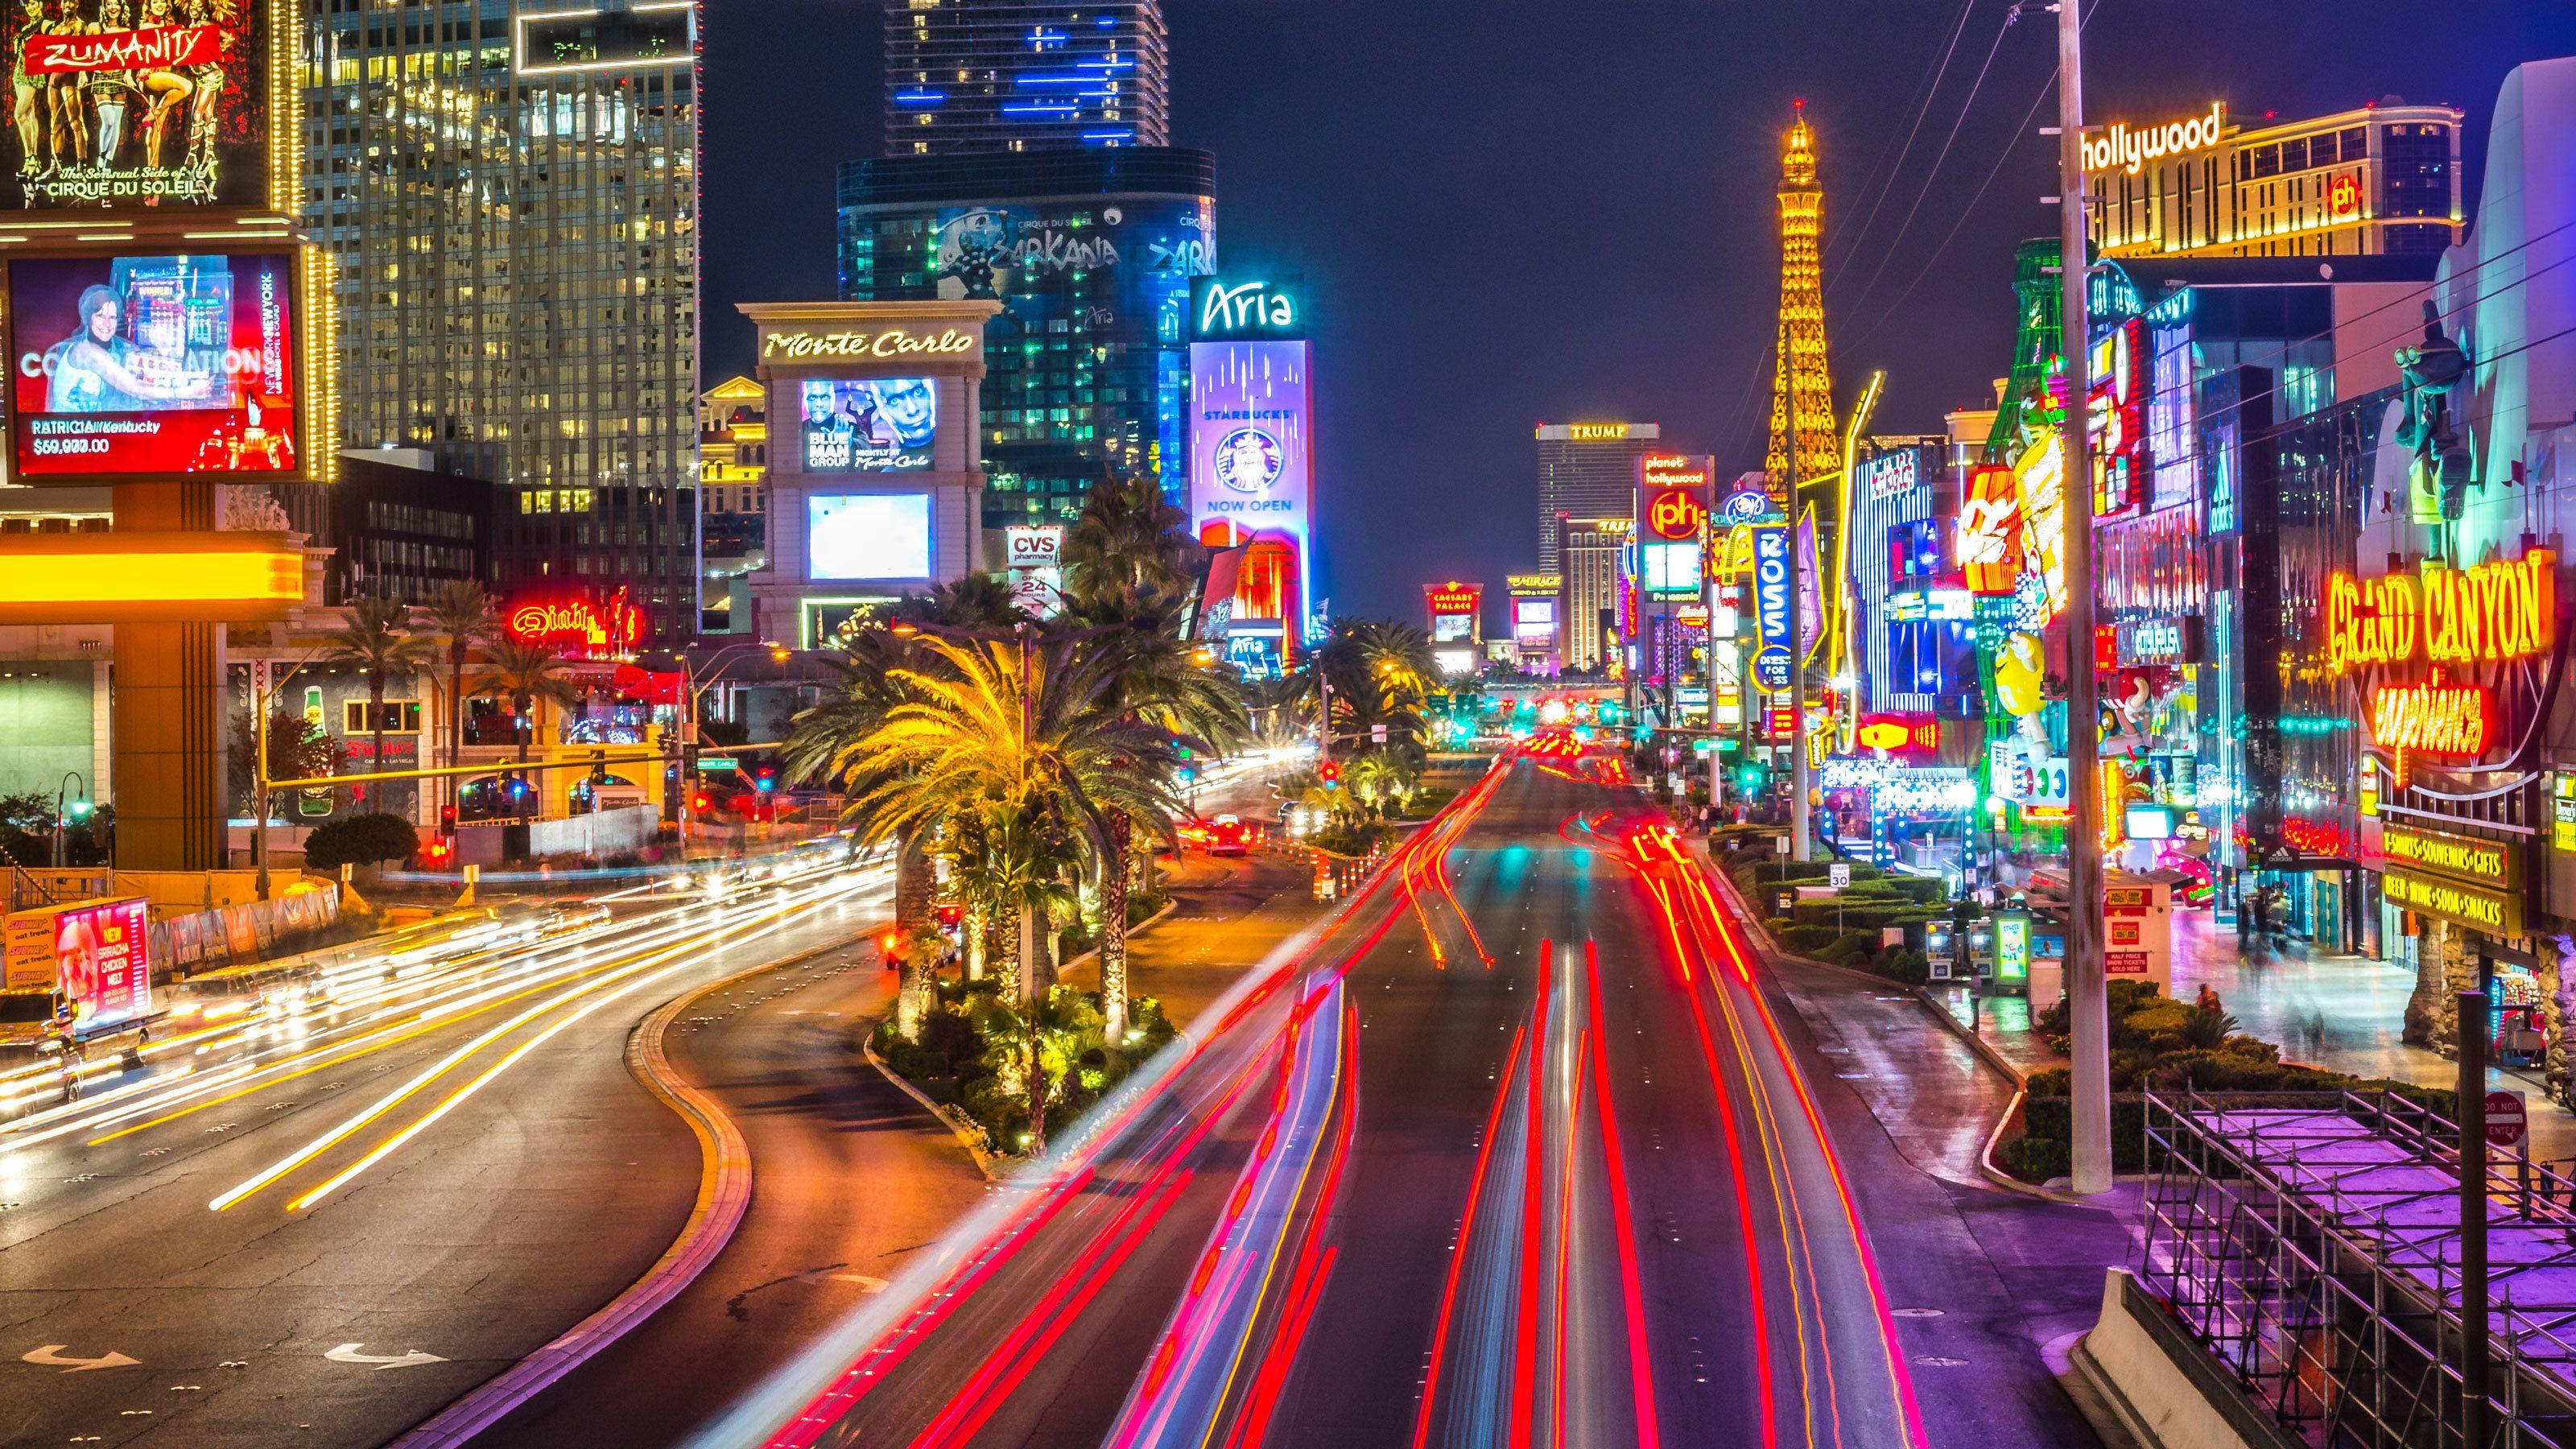 Las Vegas street at night with neon lights.